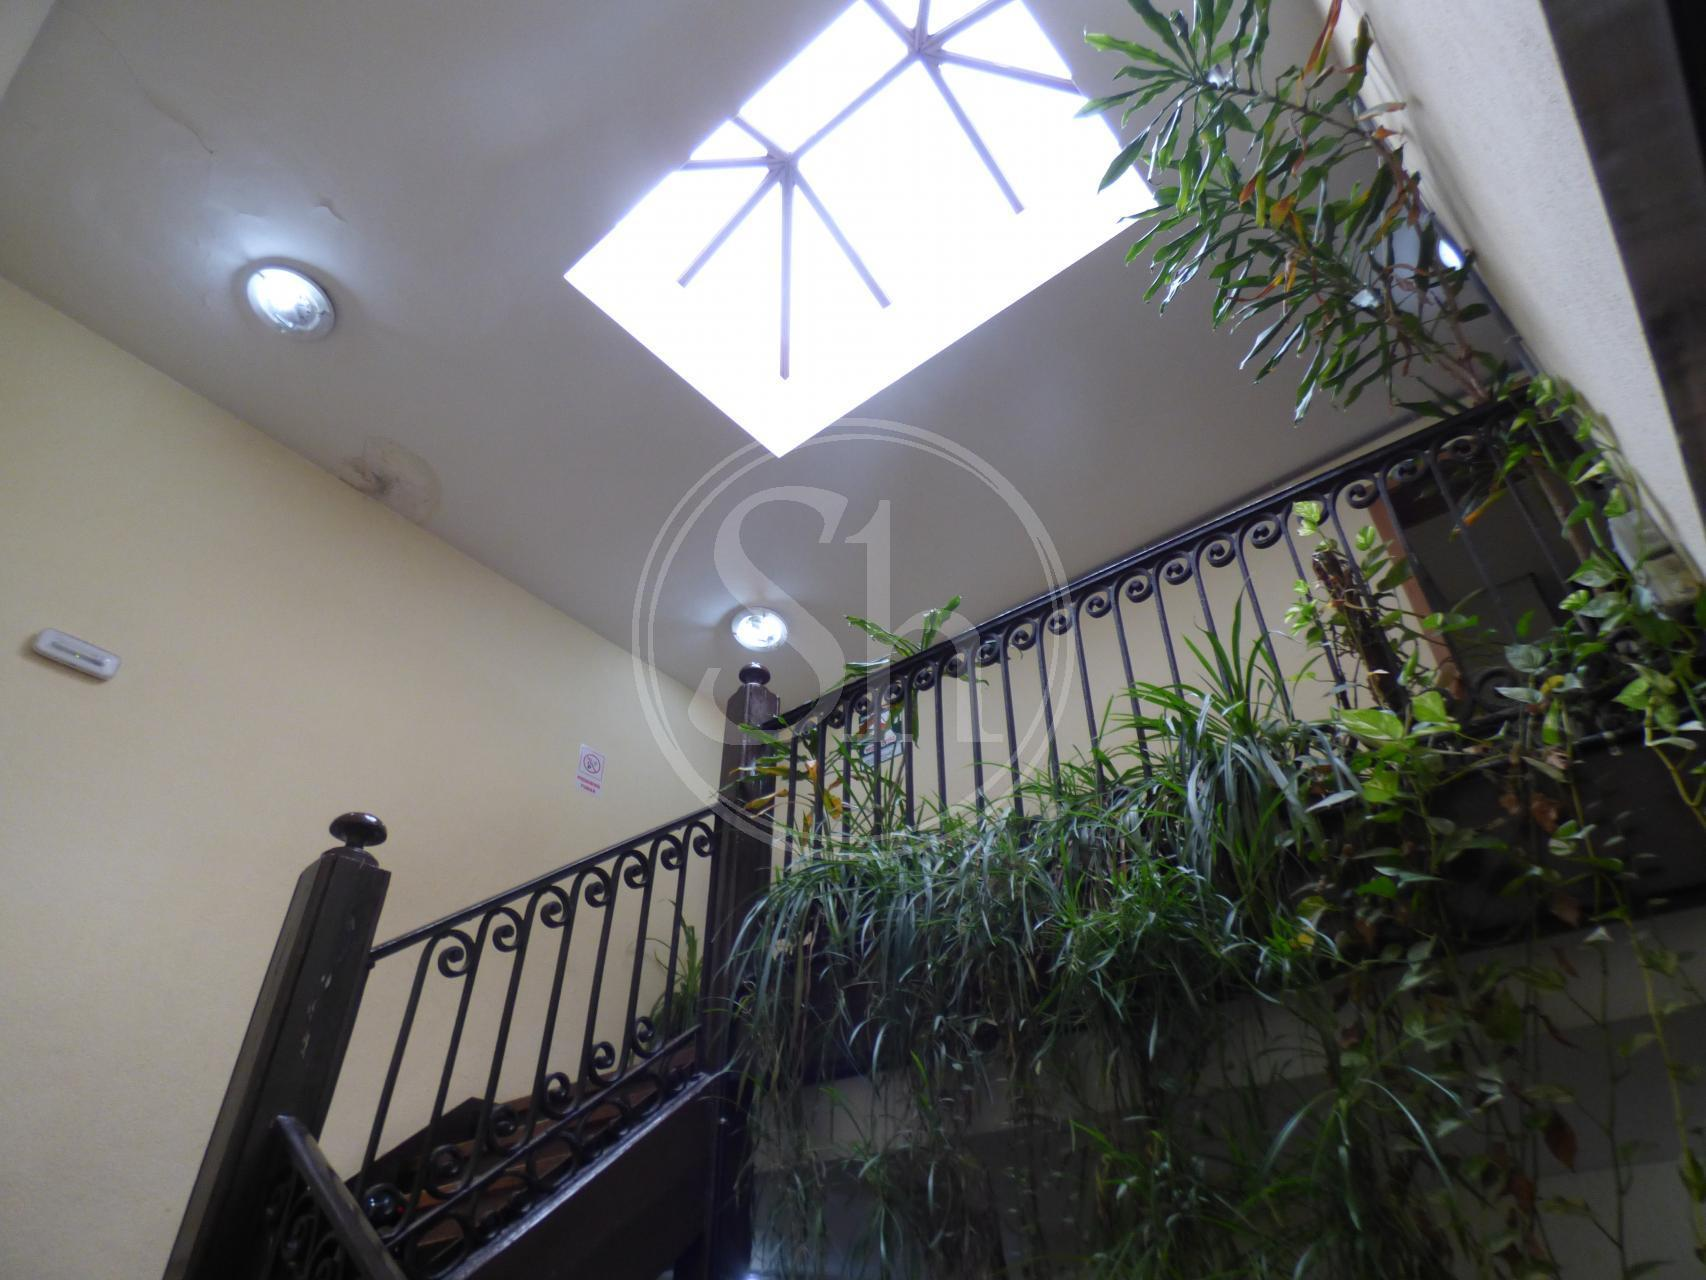 Shmadrid piso en alquiler puerta del sol for Alquiler piso puerta del angel